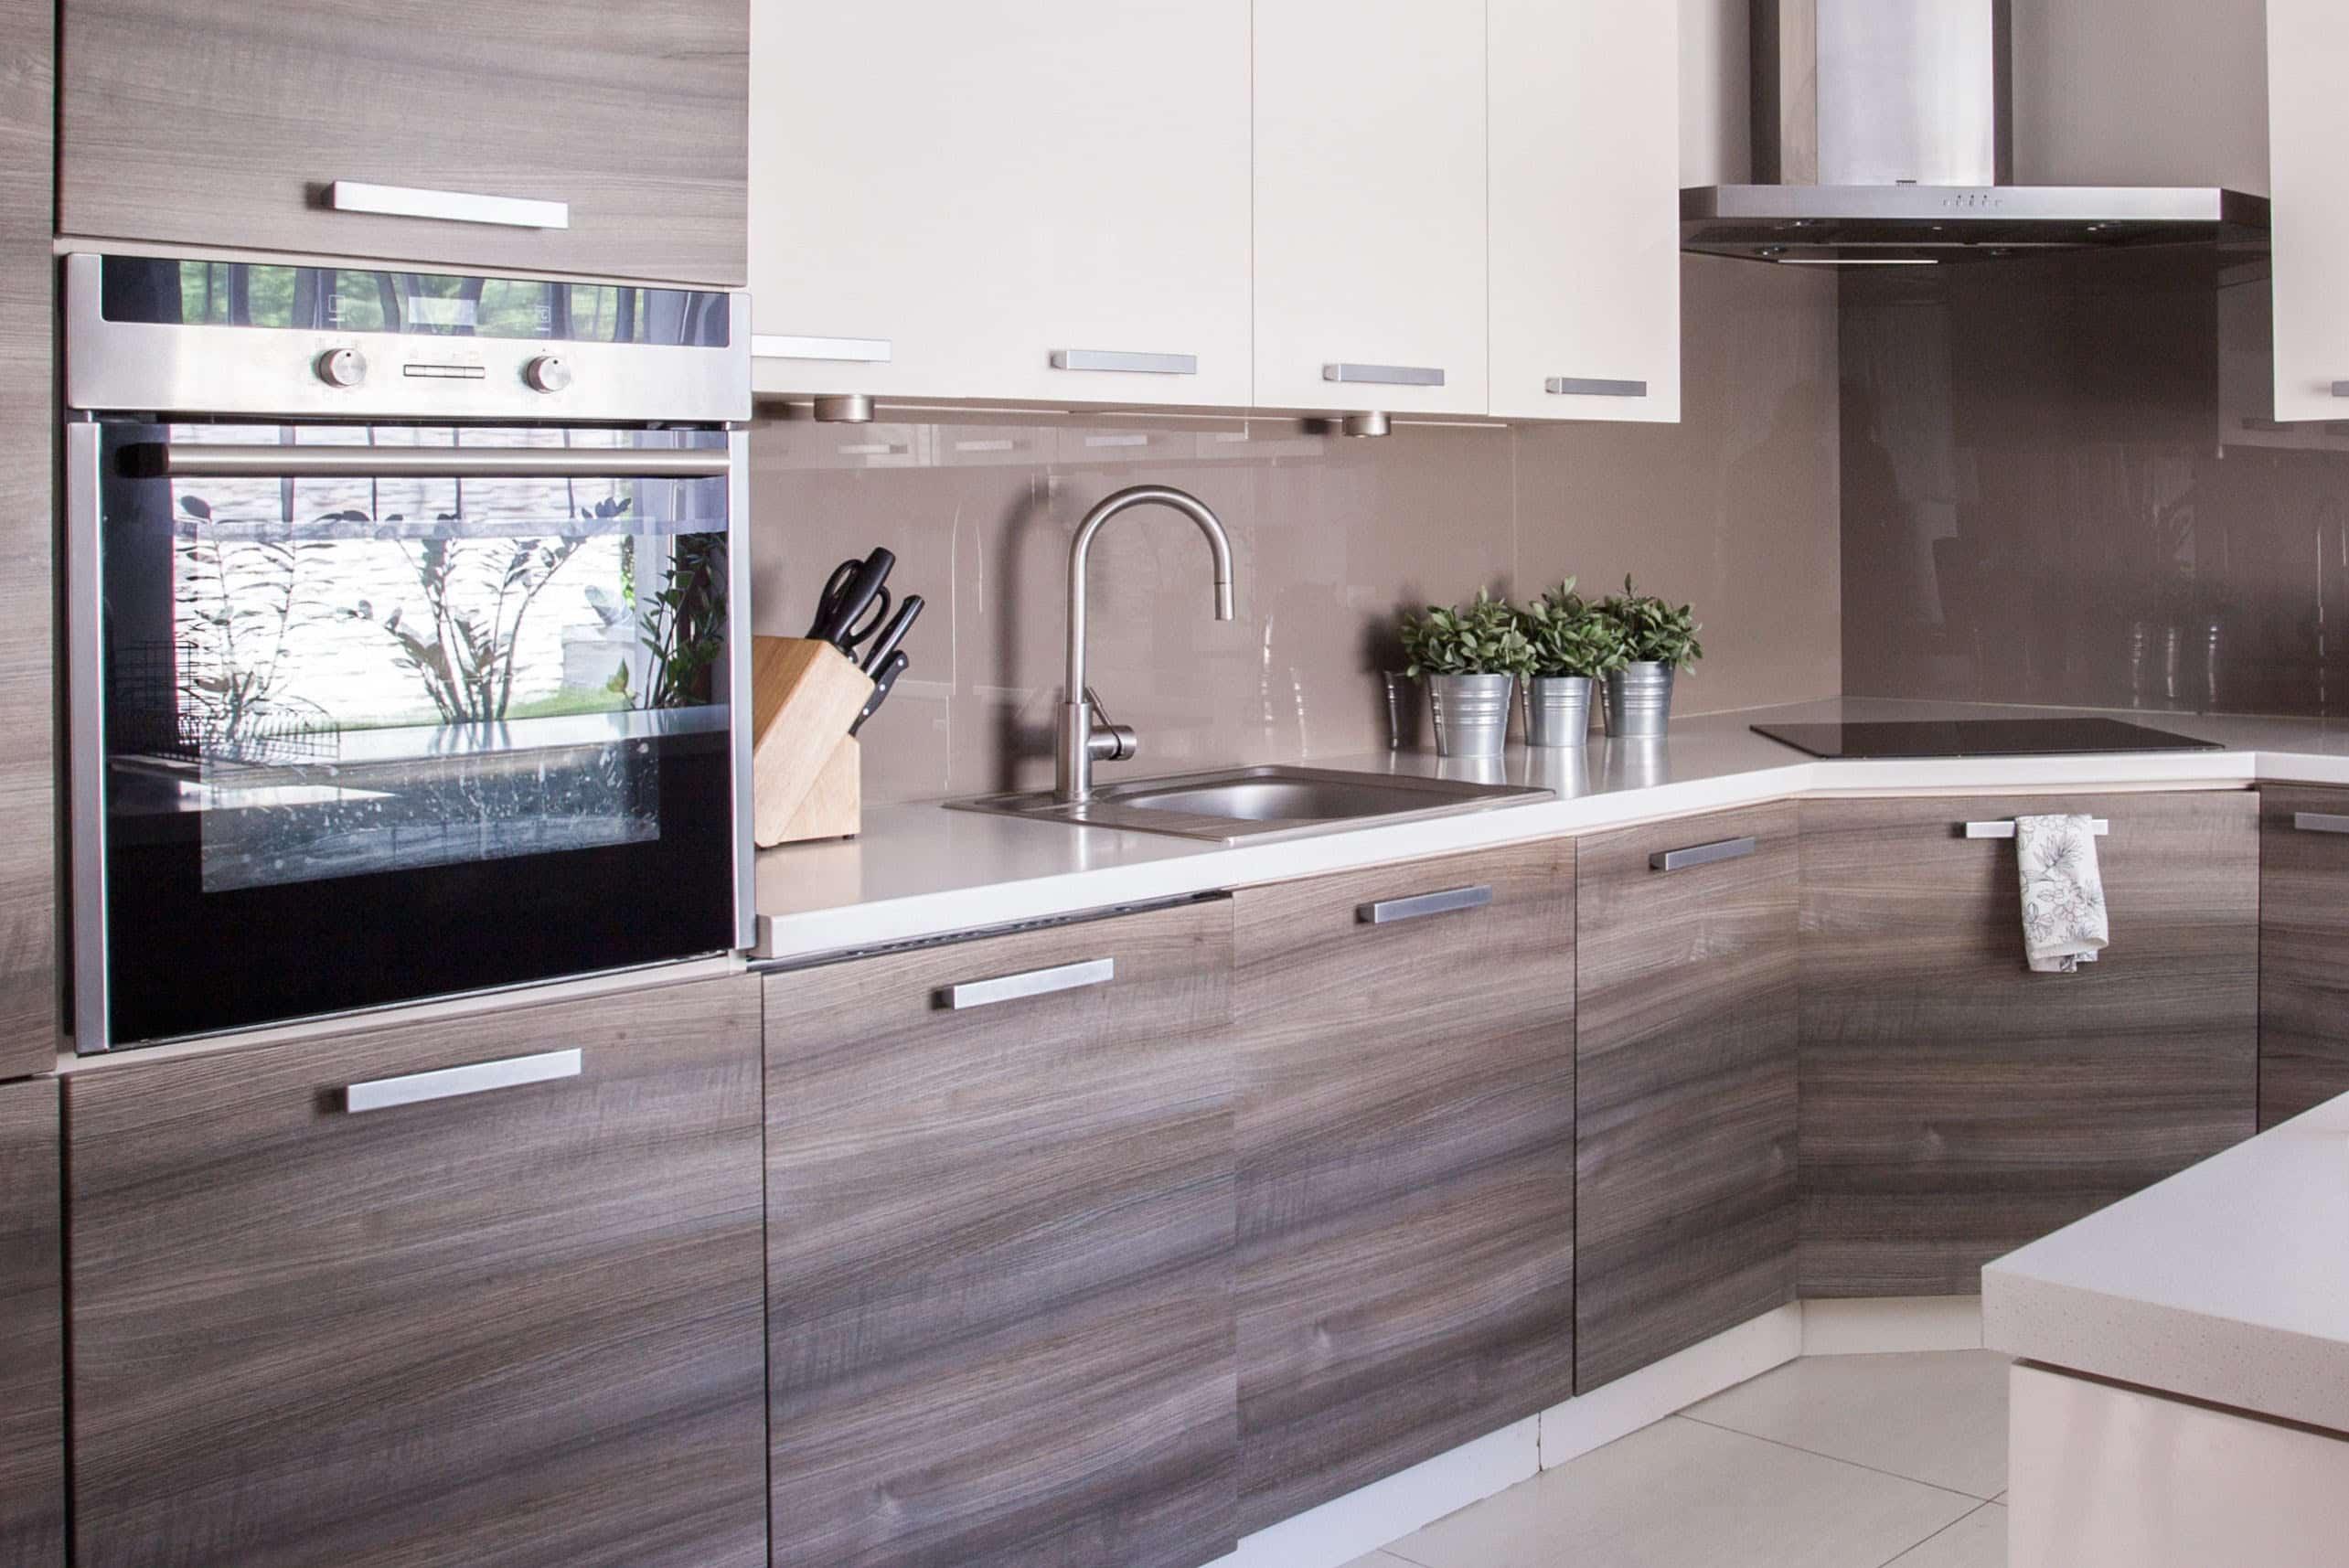 Wooden cupboards in cozy kitchen